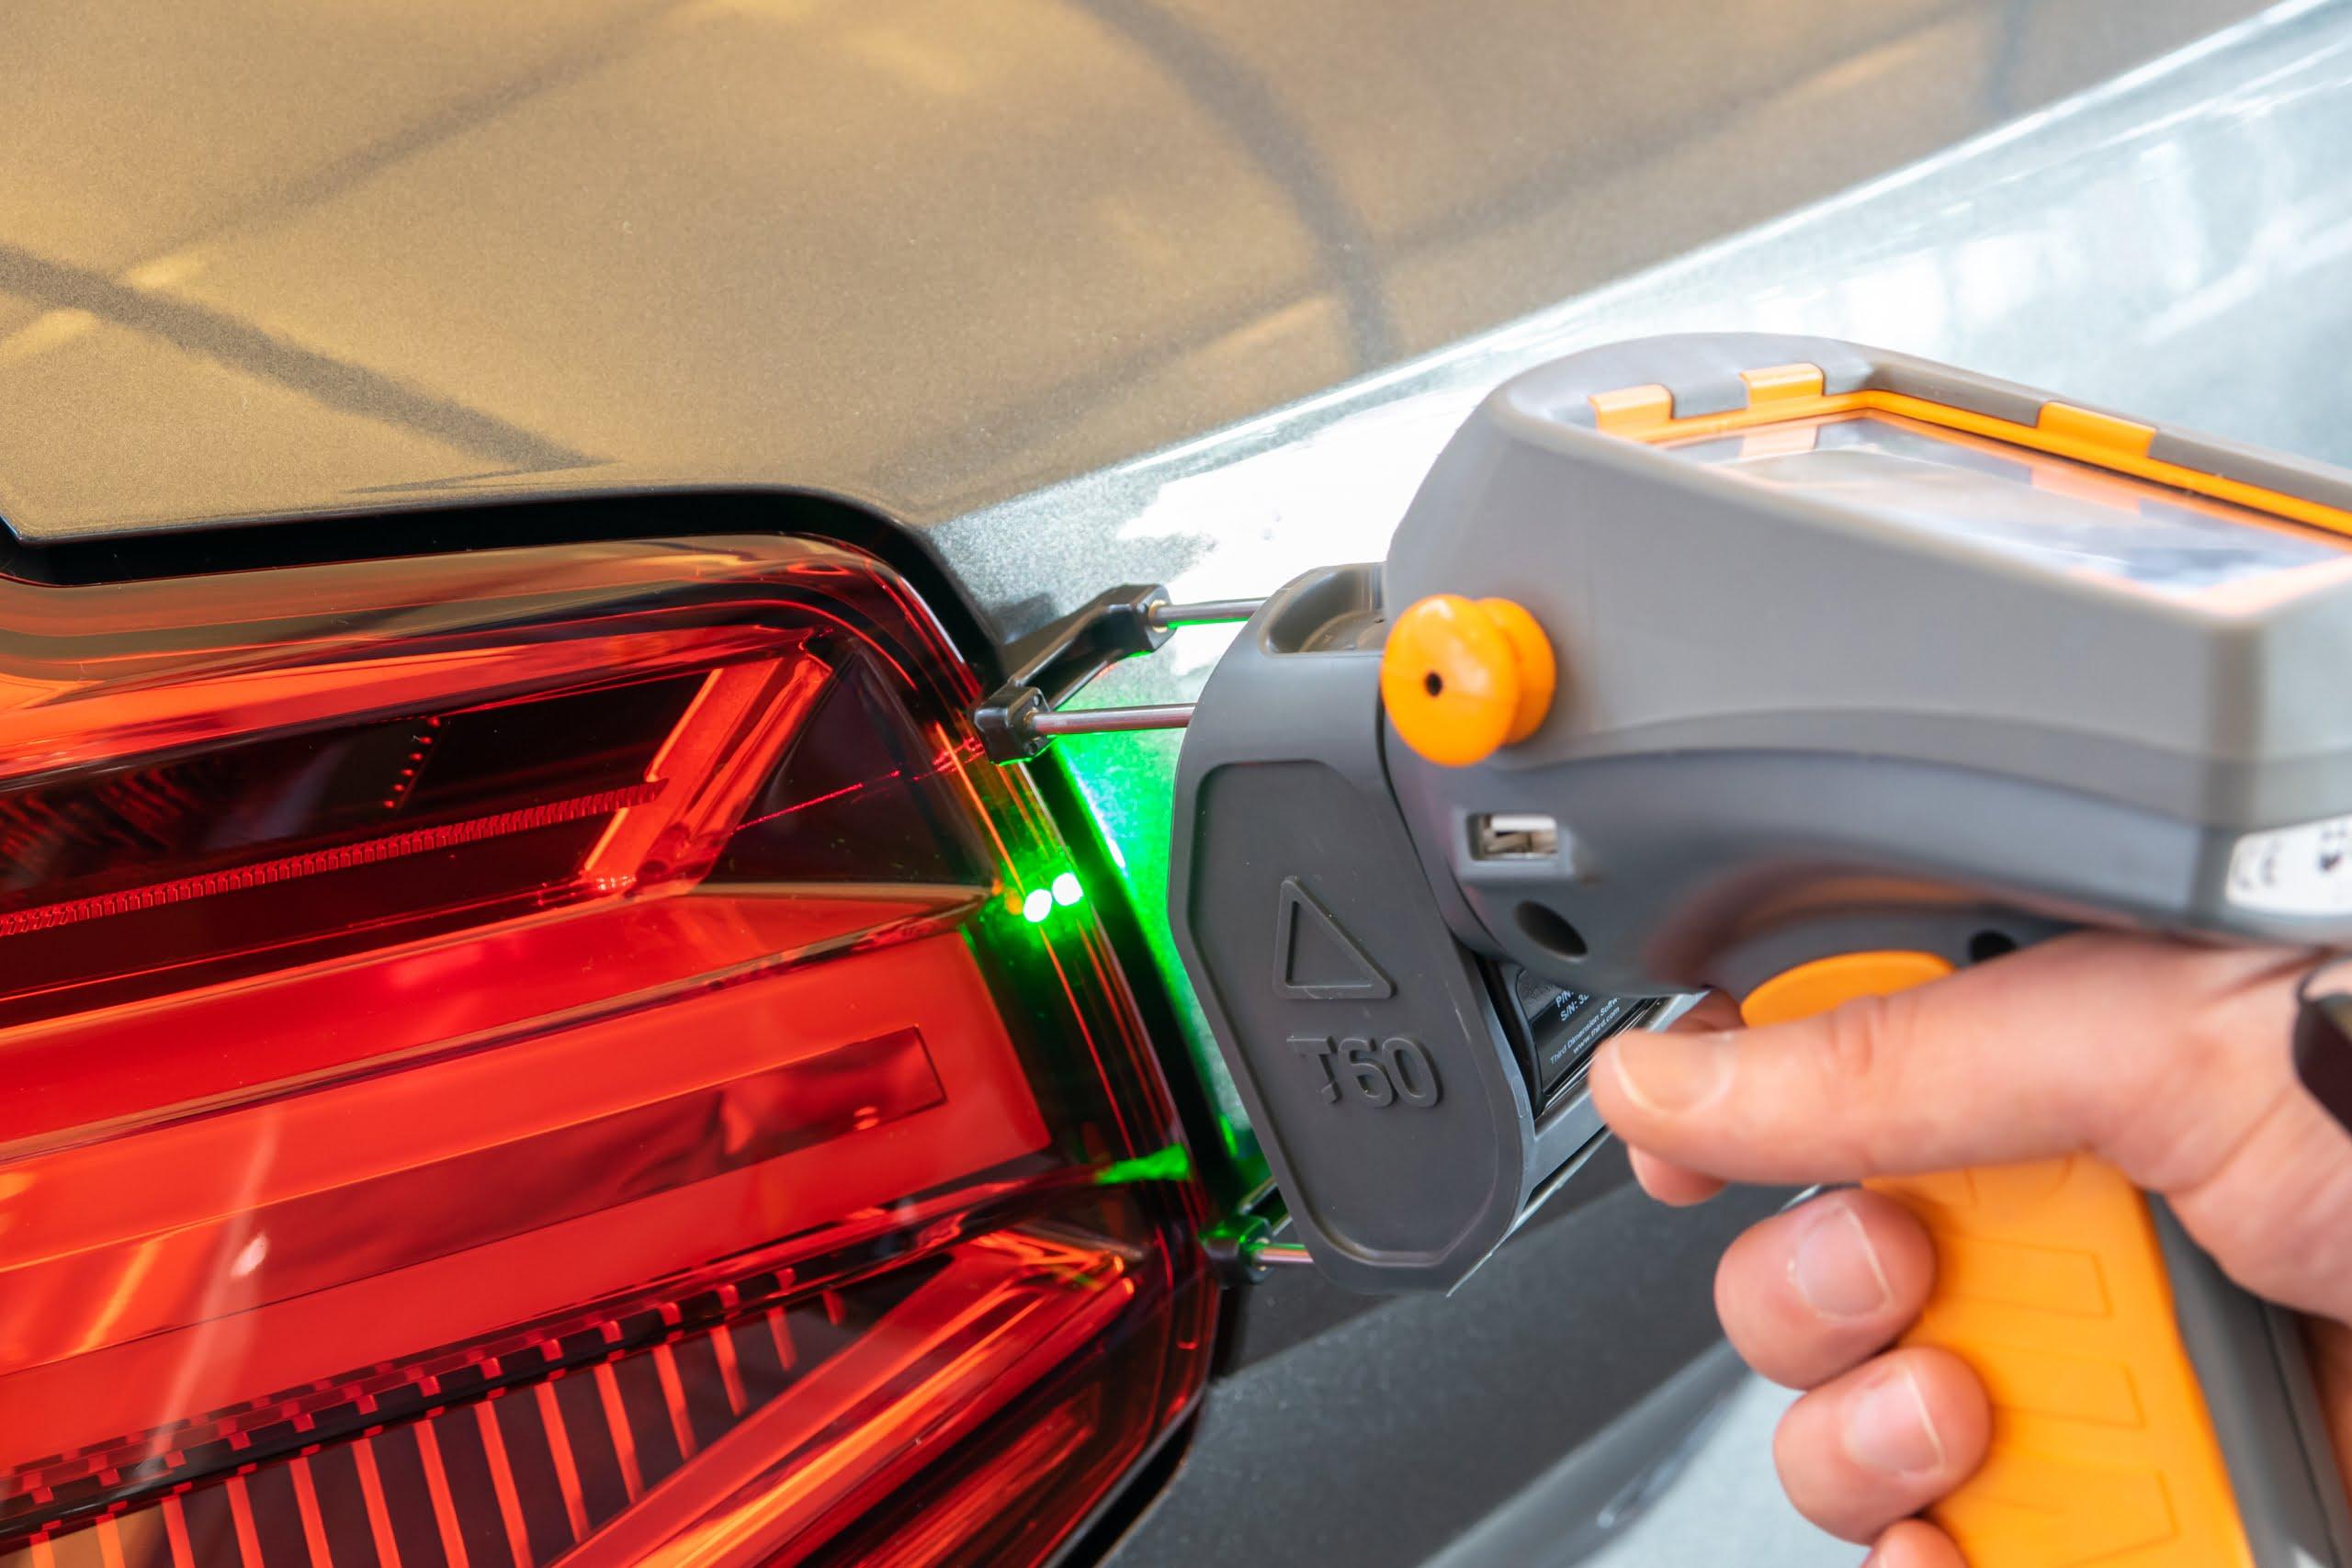 GapGun Pro2 being used on a car headlight